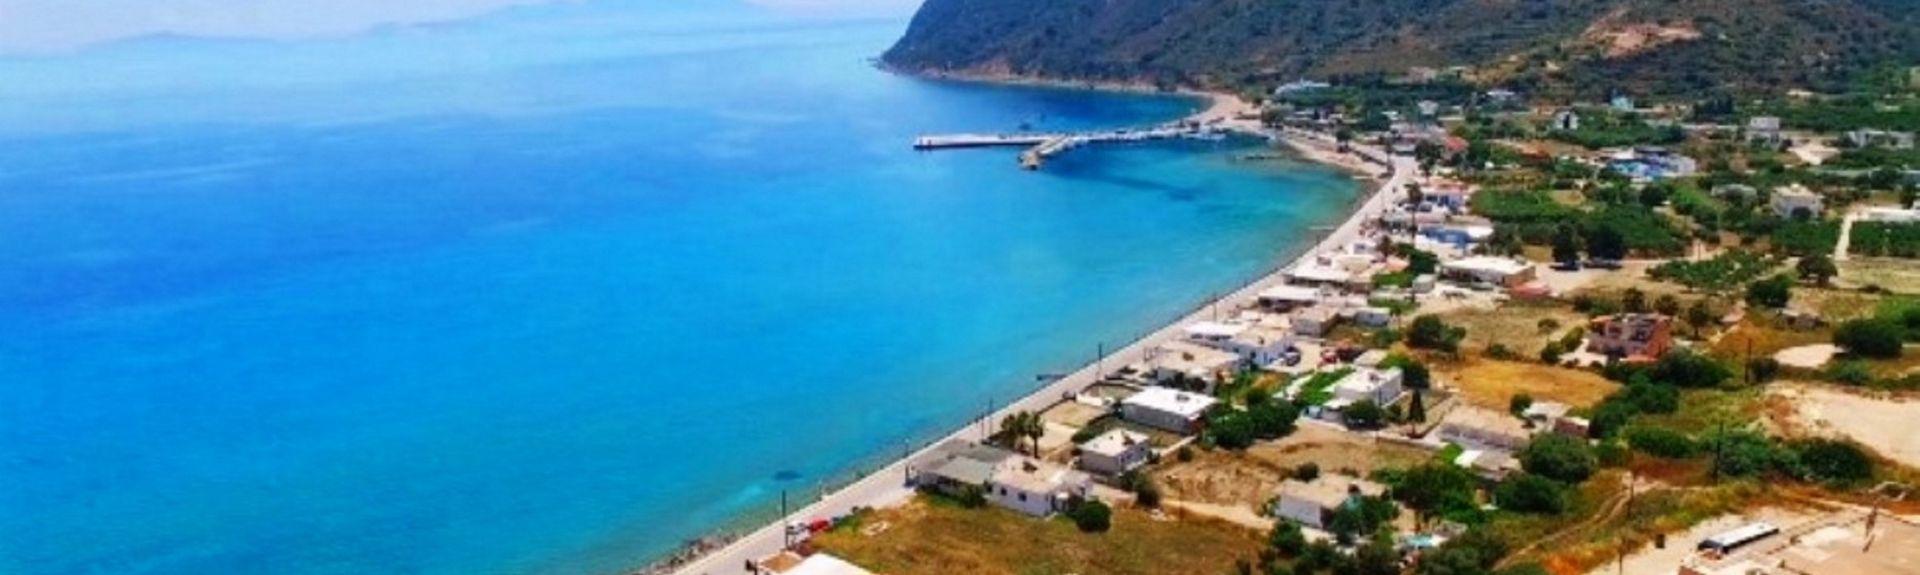 Kefalos Beach, Kos, Greece